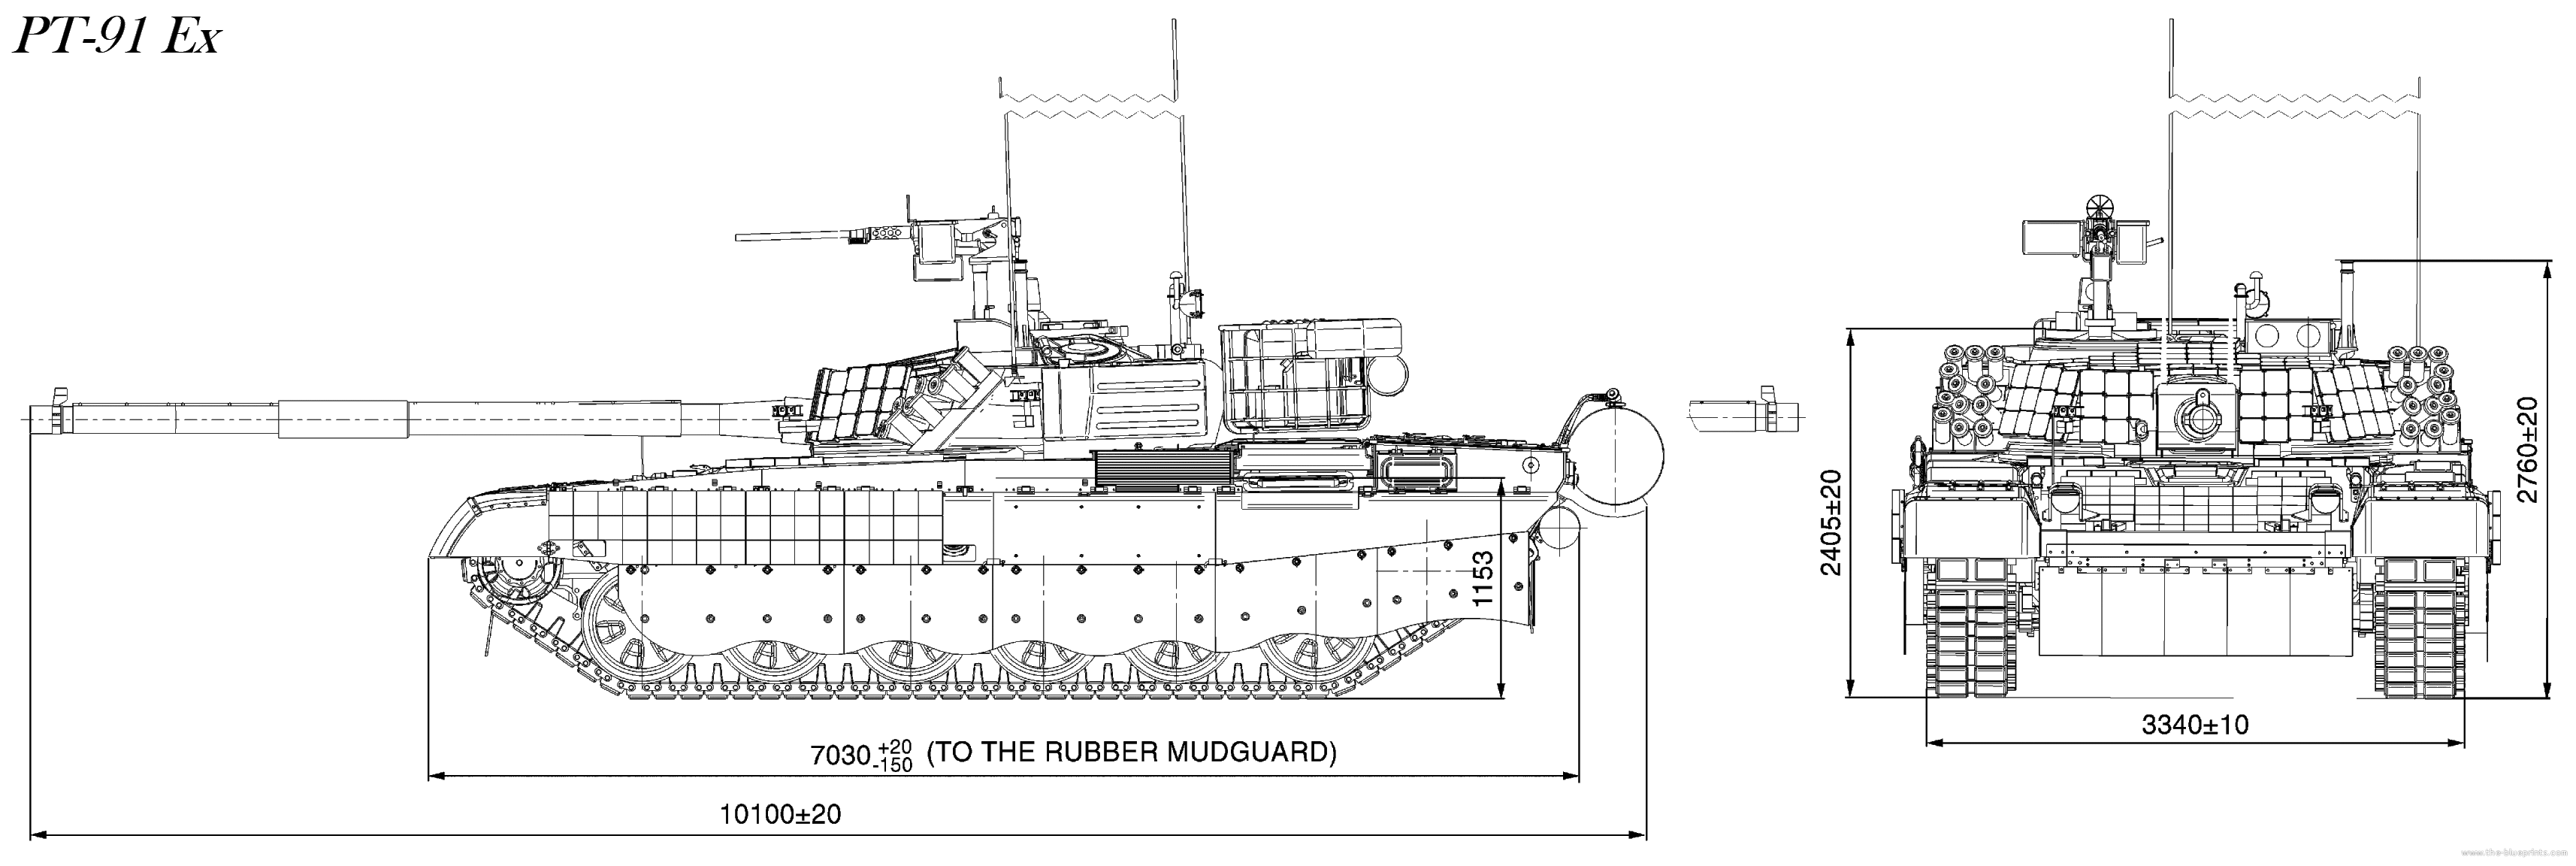 Tank Twardy PT 91 Ex